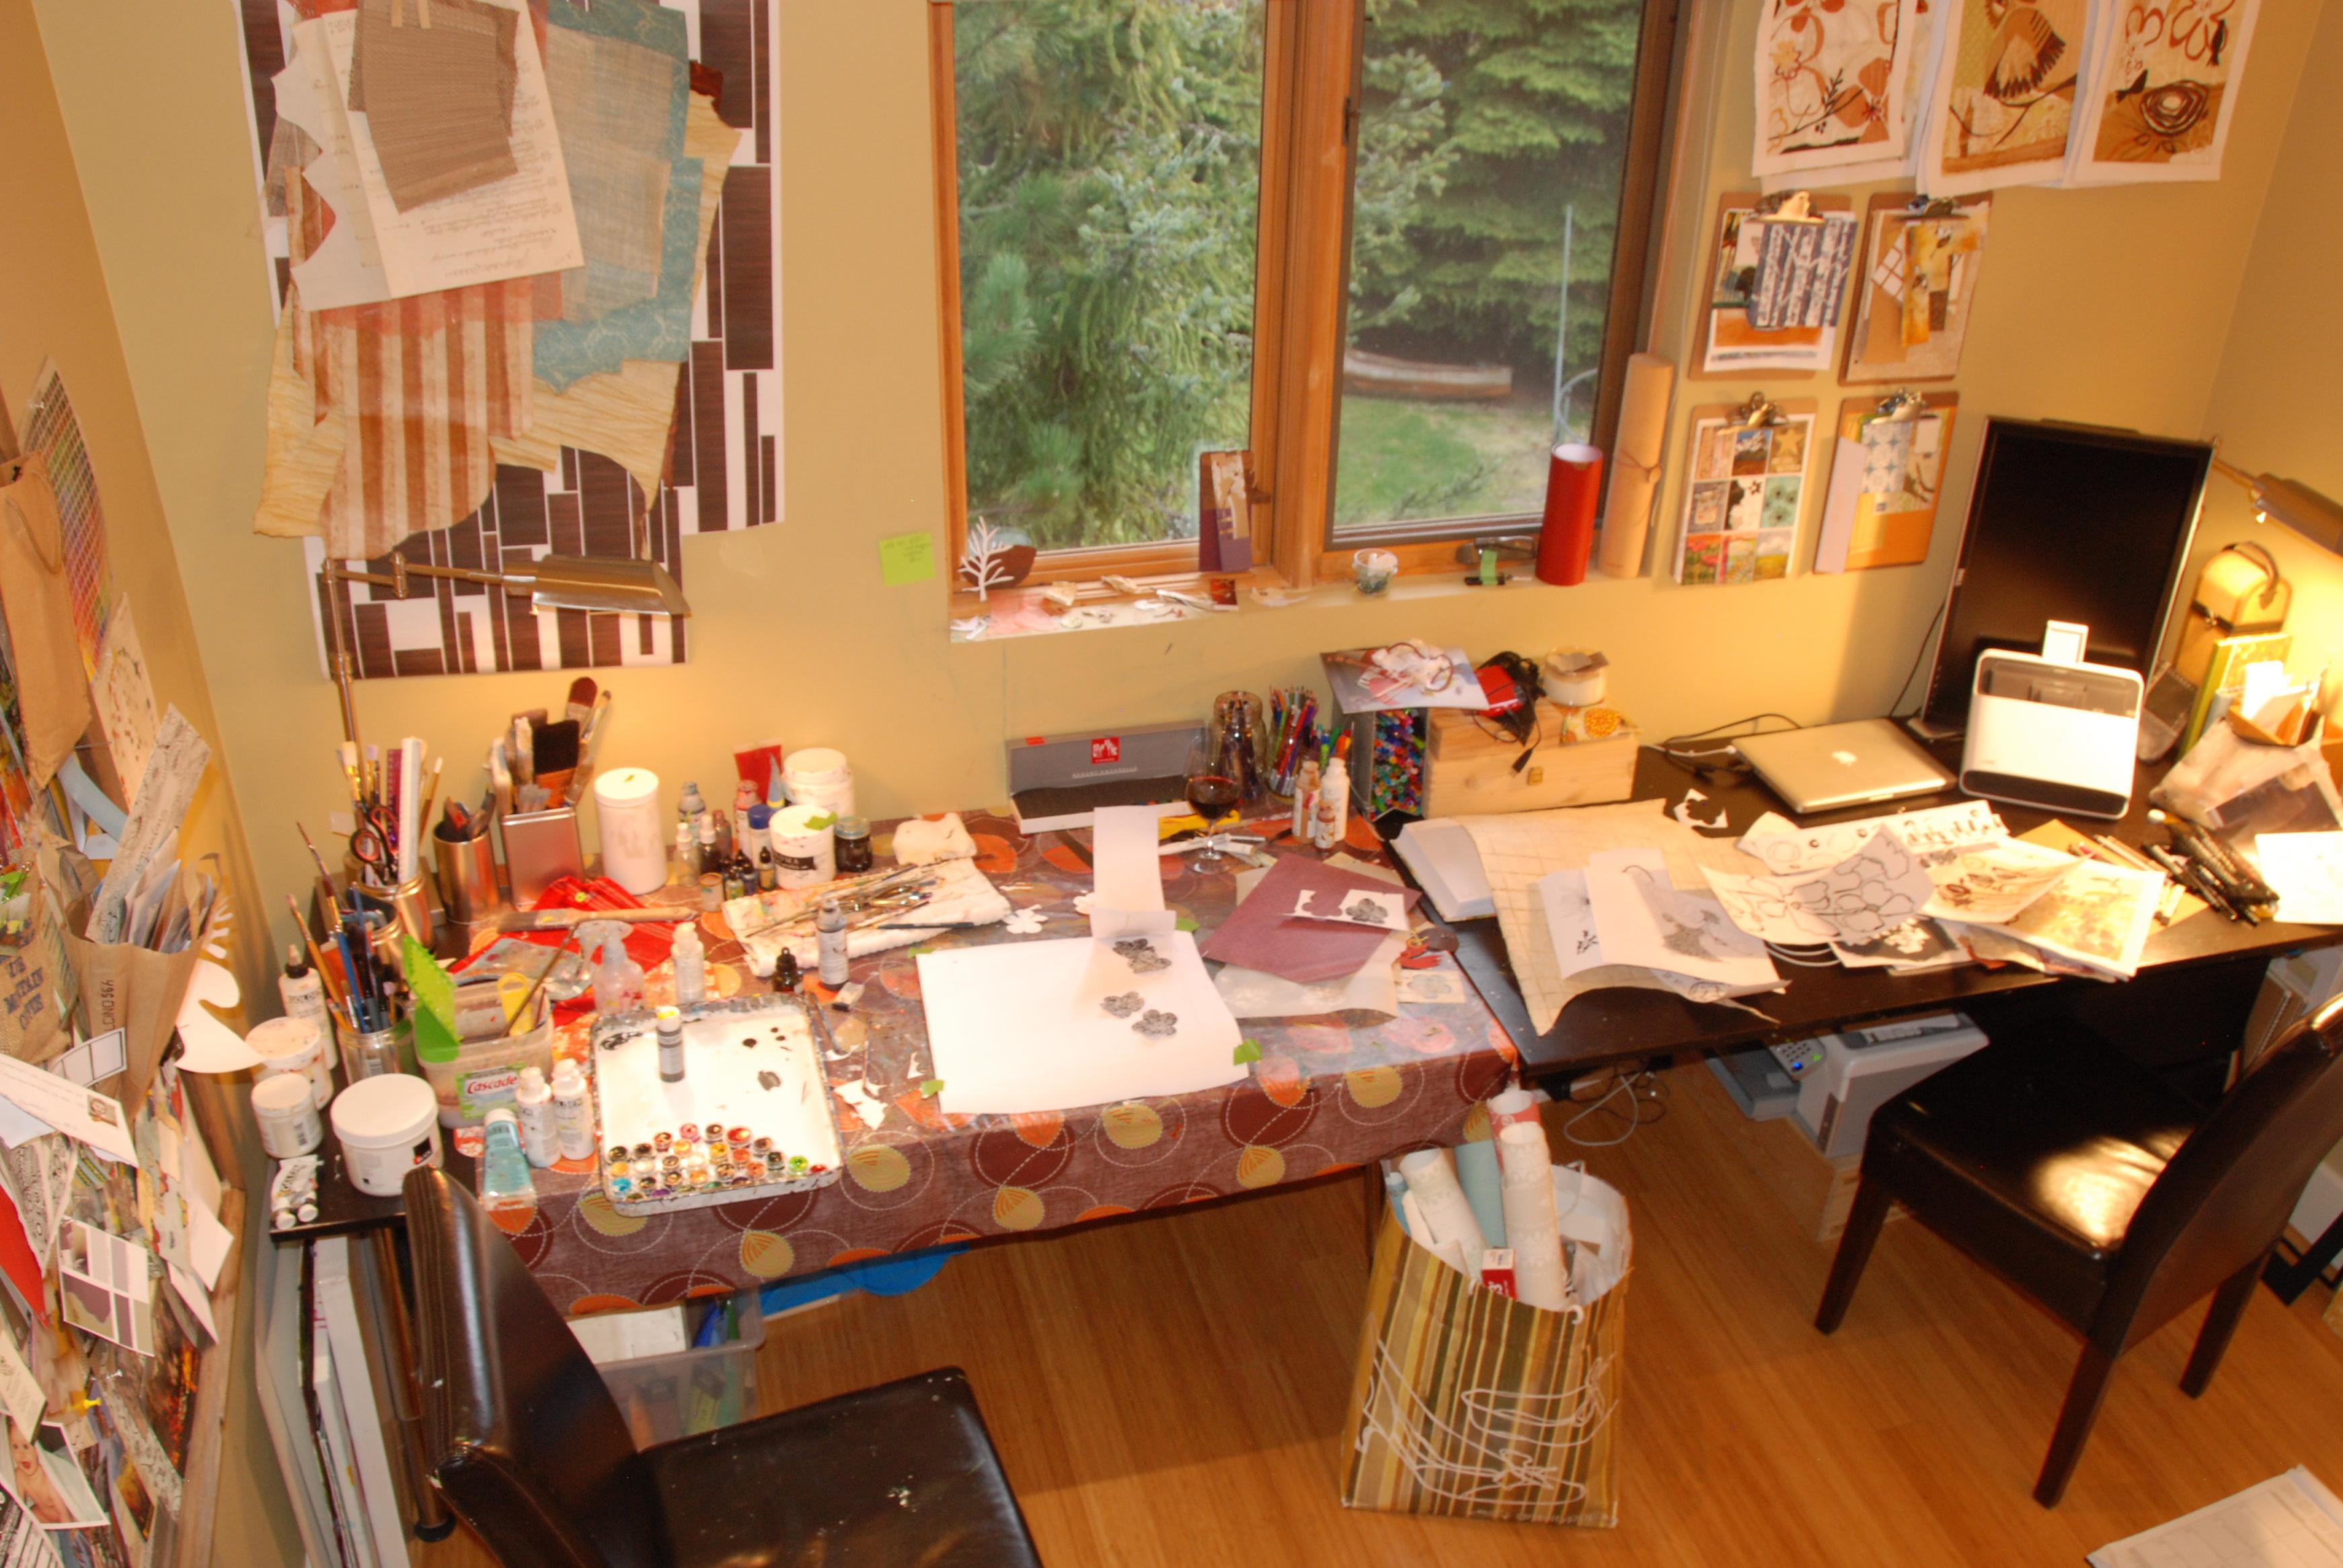 Art Studio Painting Mixed Media